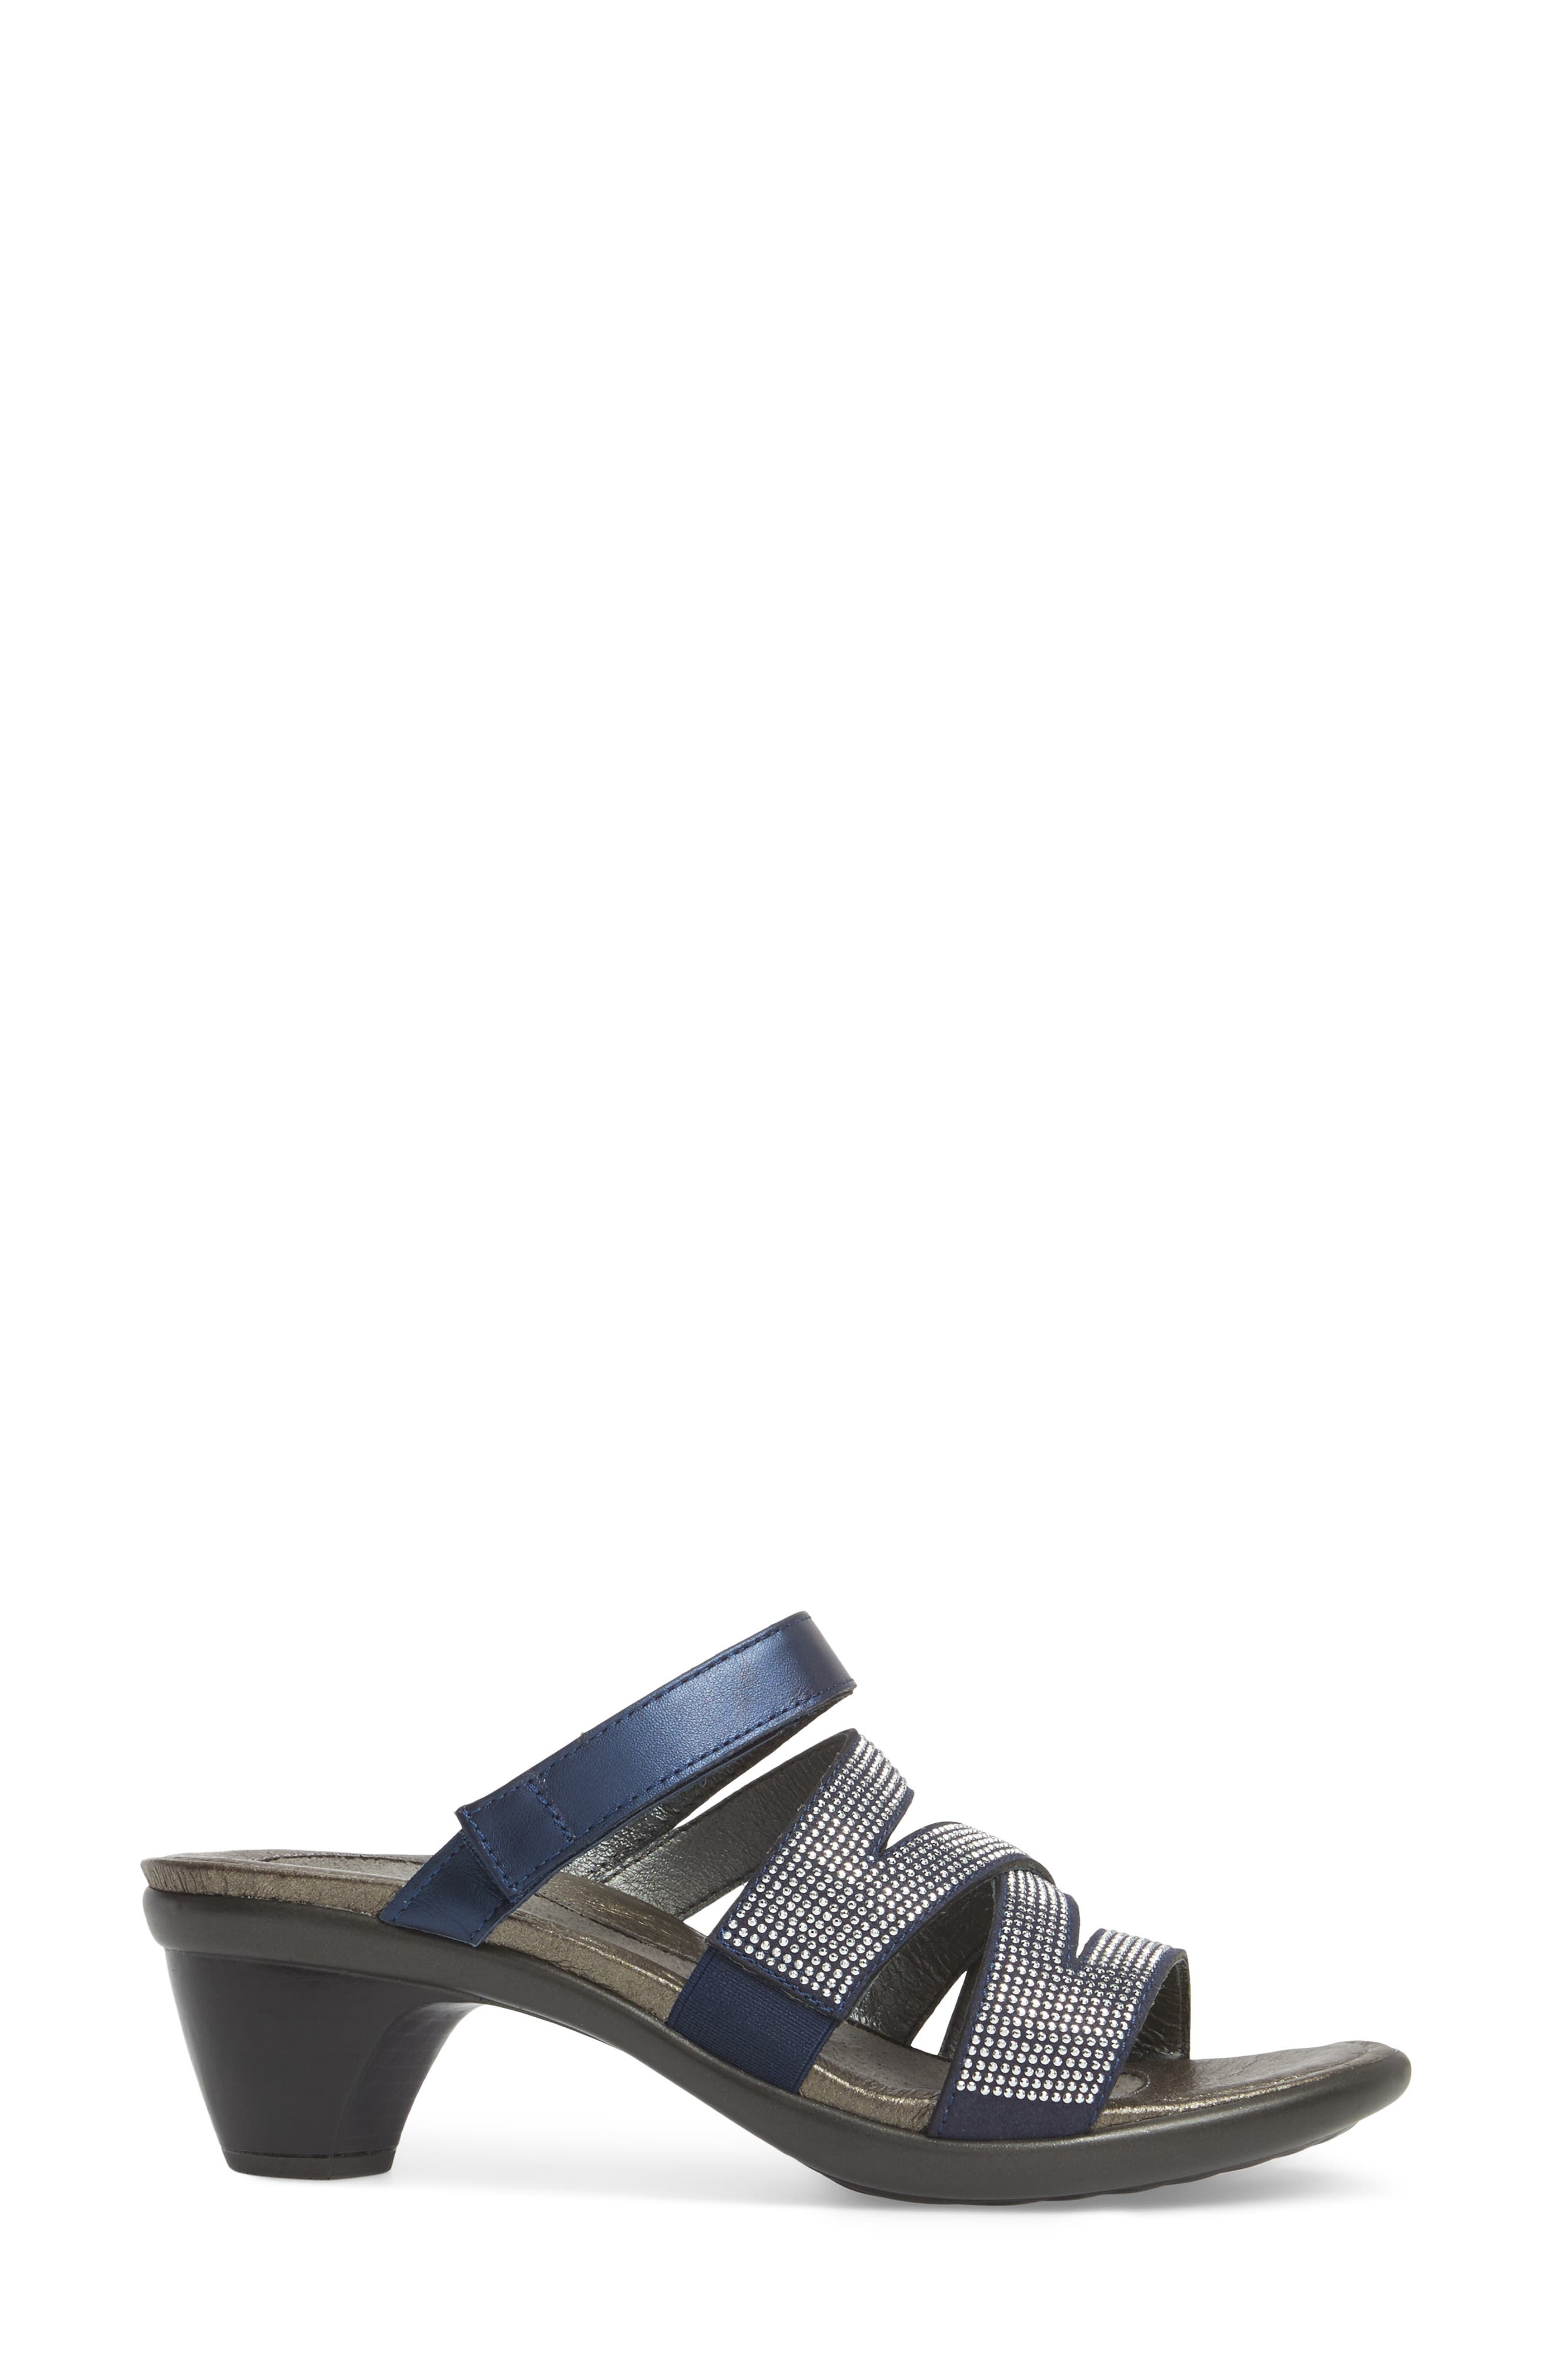 Formal Sandal,                             Alternate thumbnail 3, color,                             DARK BLUE LEATHER